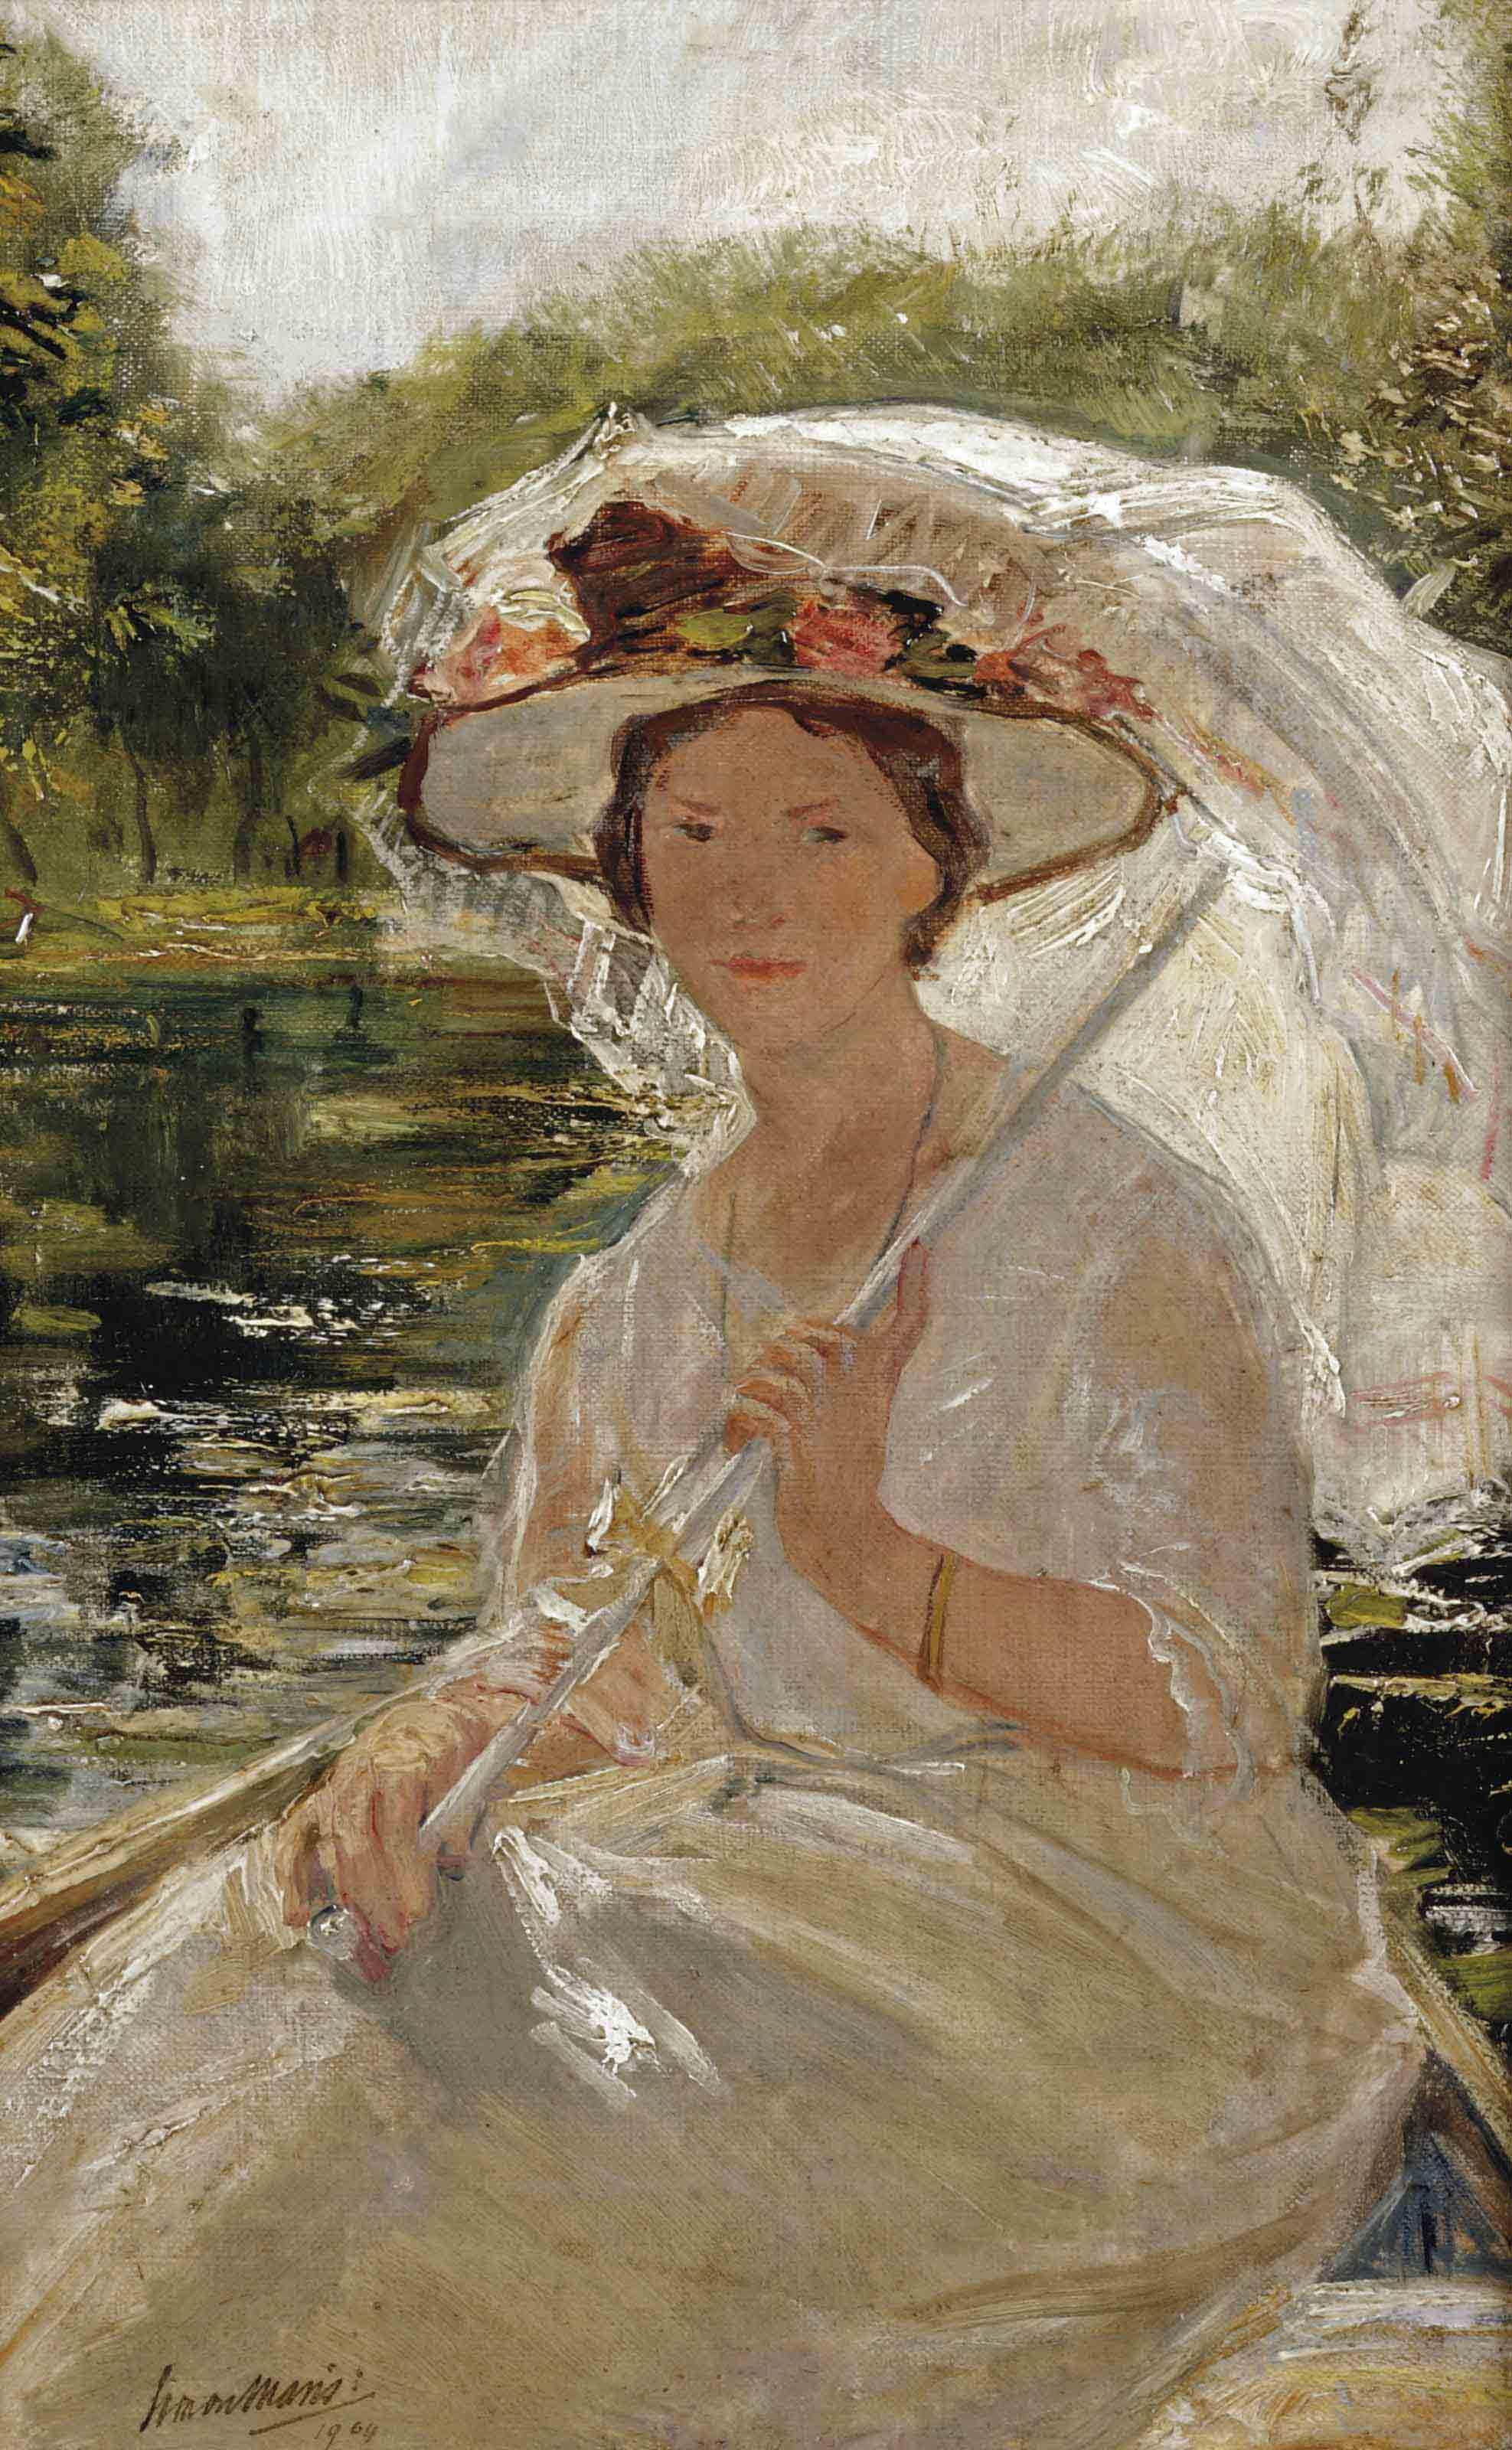 Elegant woman with an umbrella